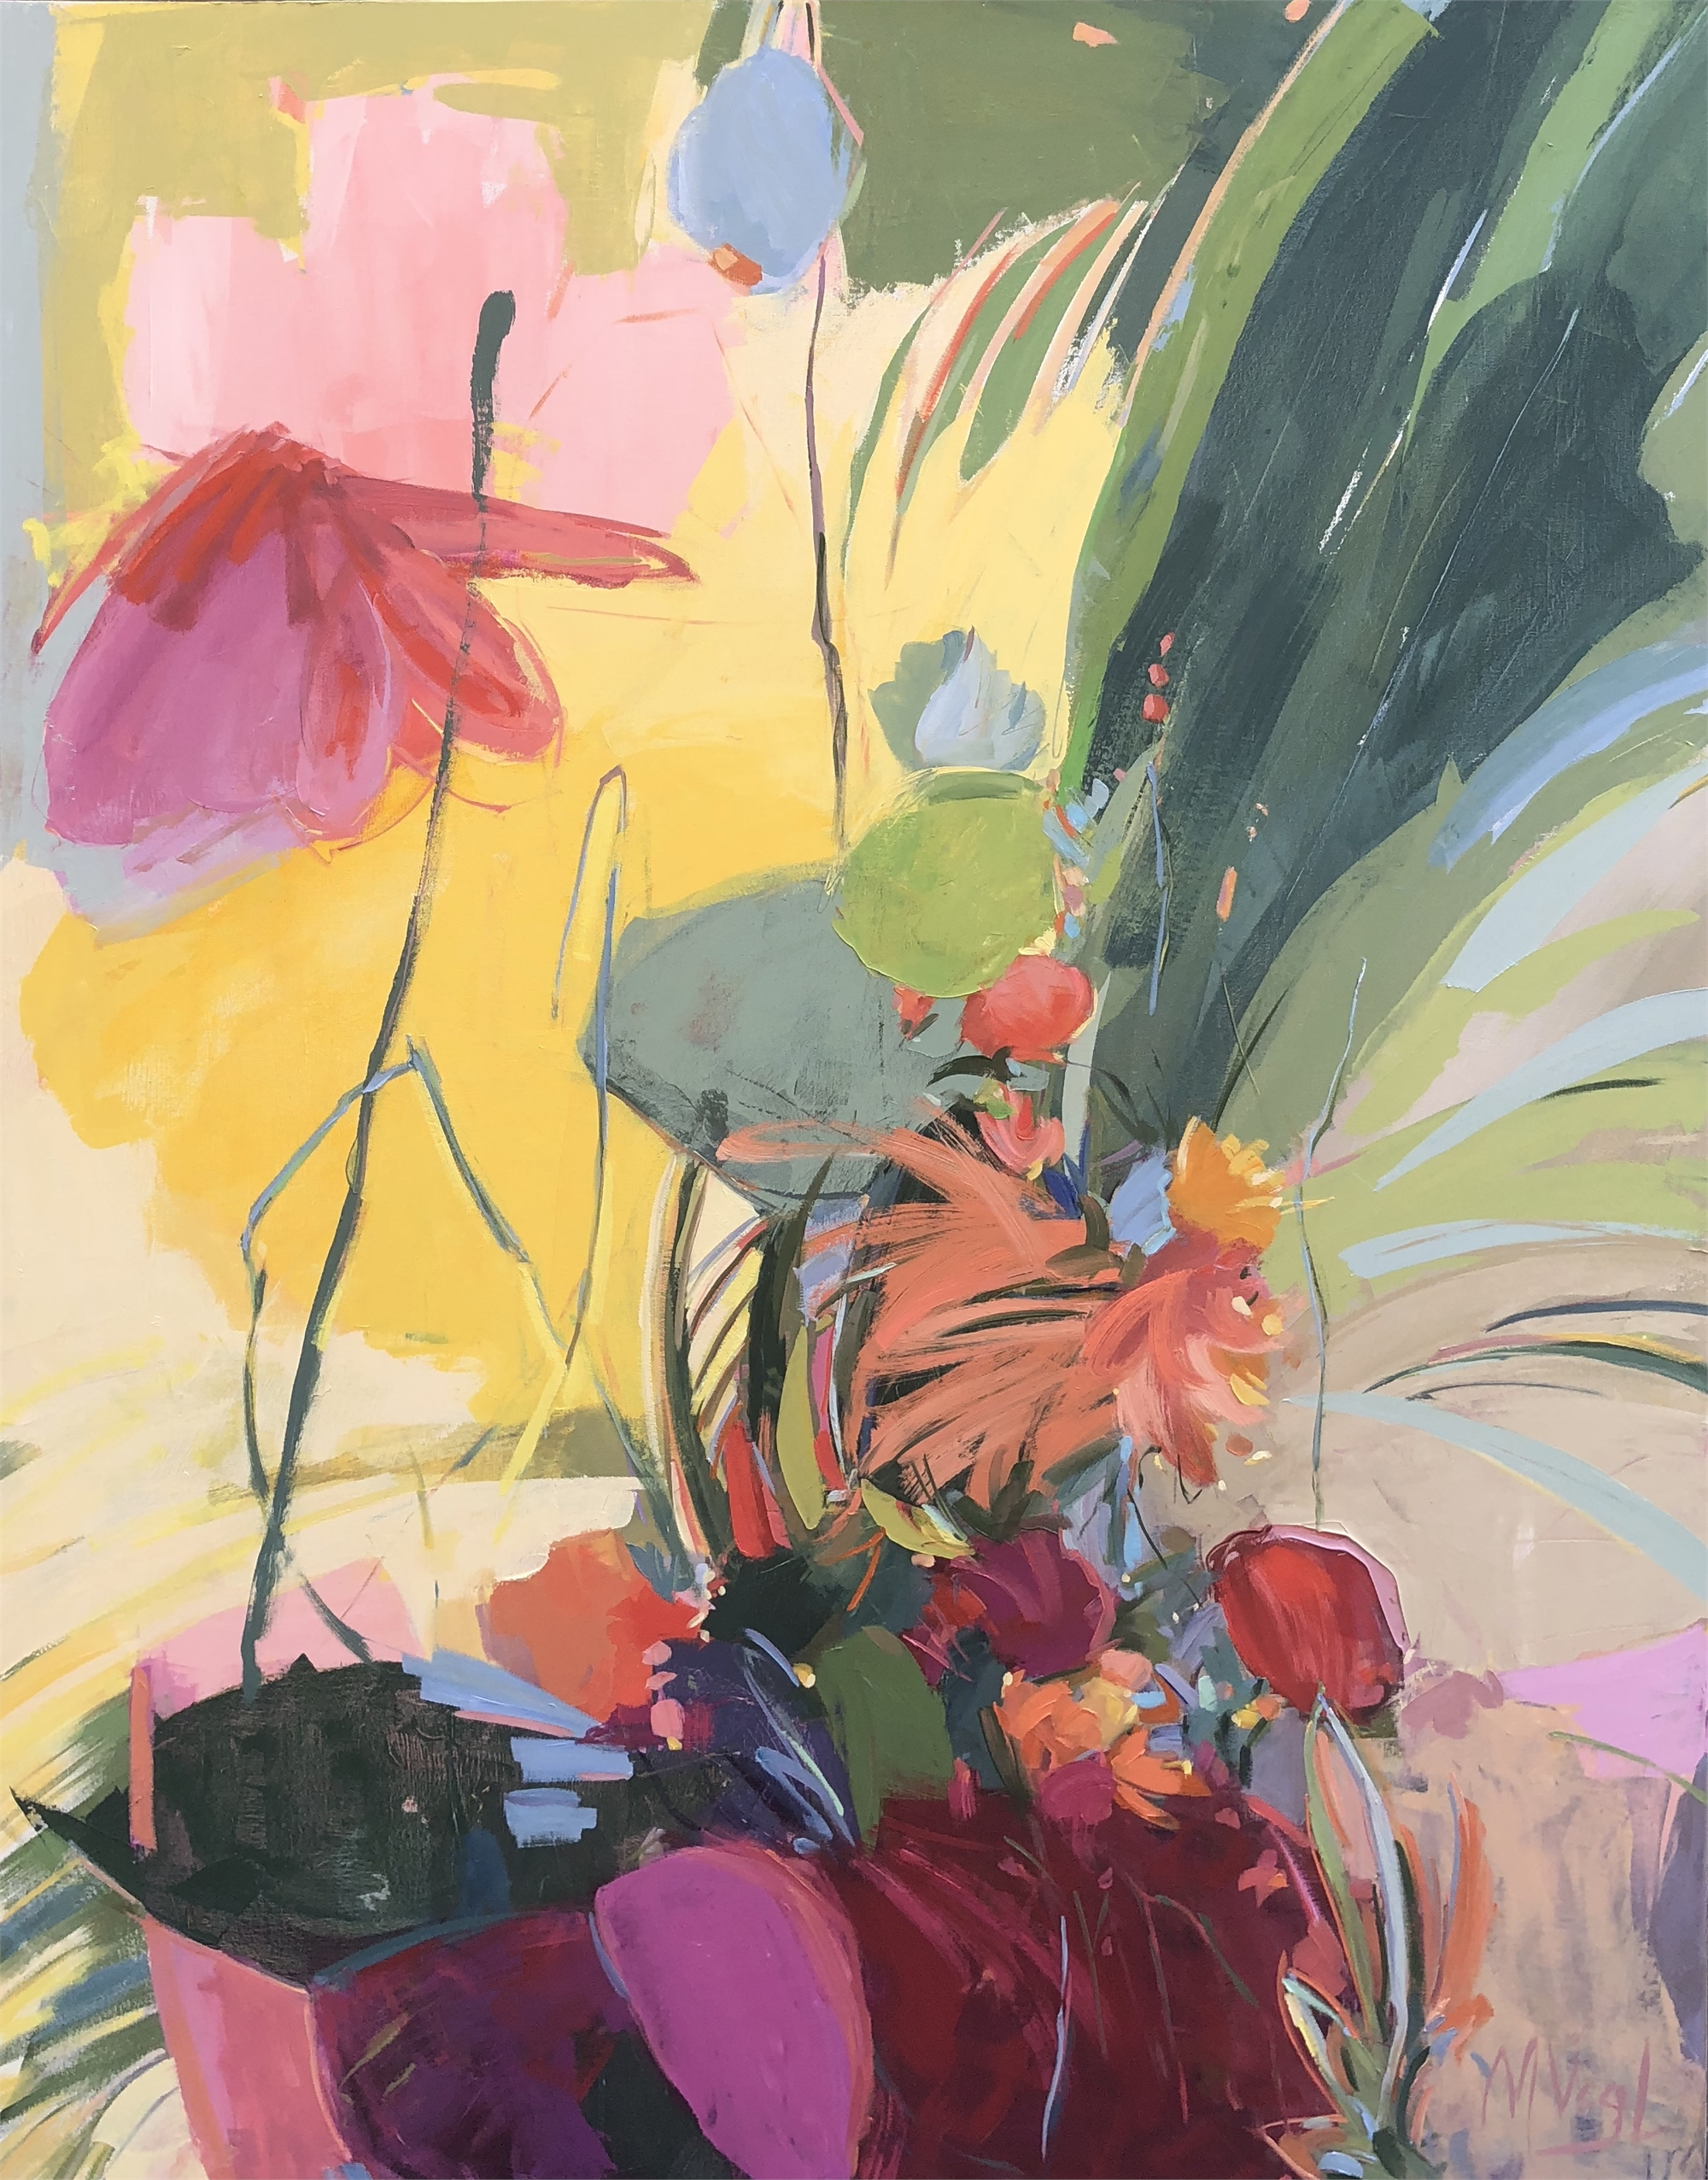 Garden of a Gypsy by Marissa Vogl